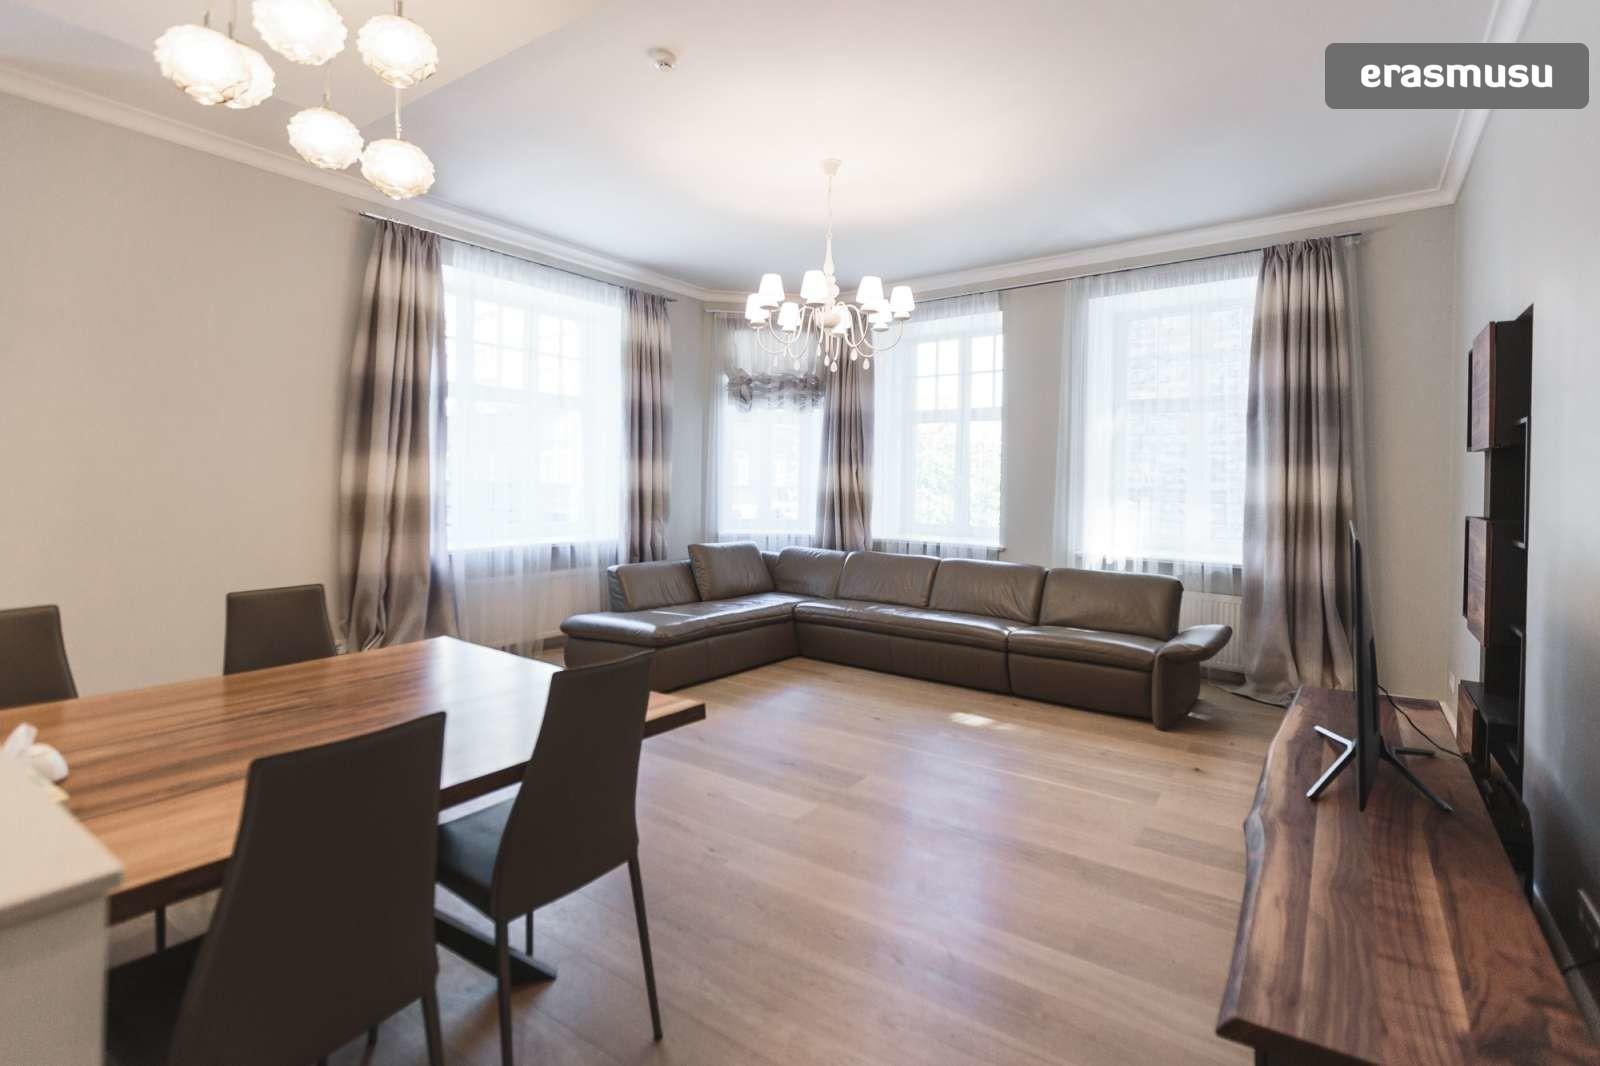 elegant-1-bedroom-apartment-rent-centrs-e21911ff5b8b6875781c820e